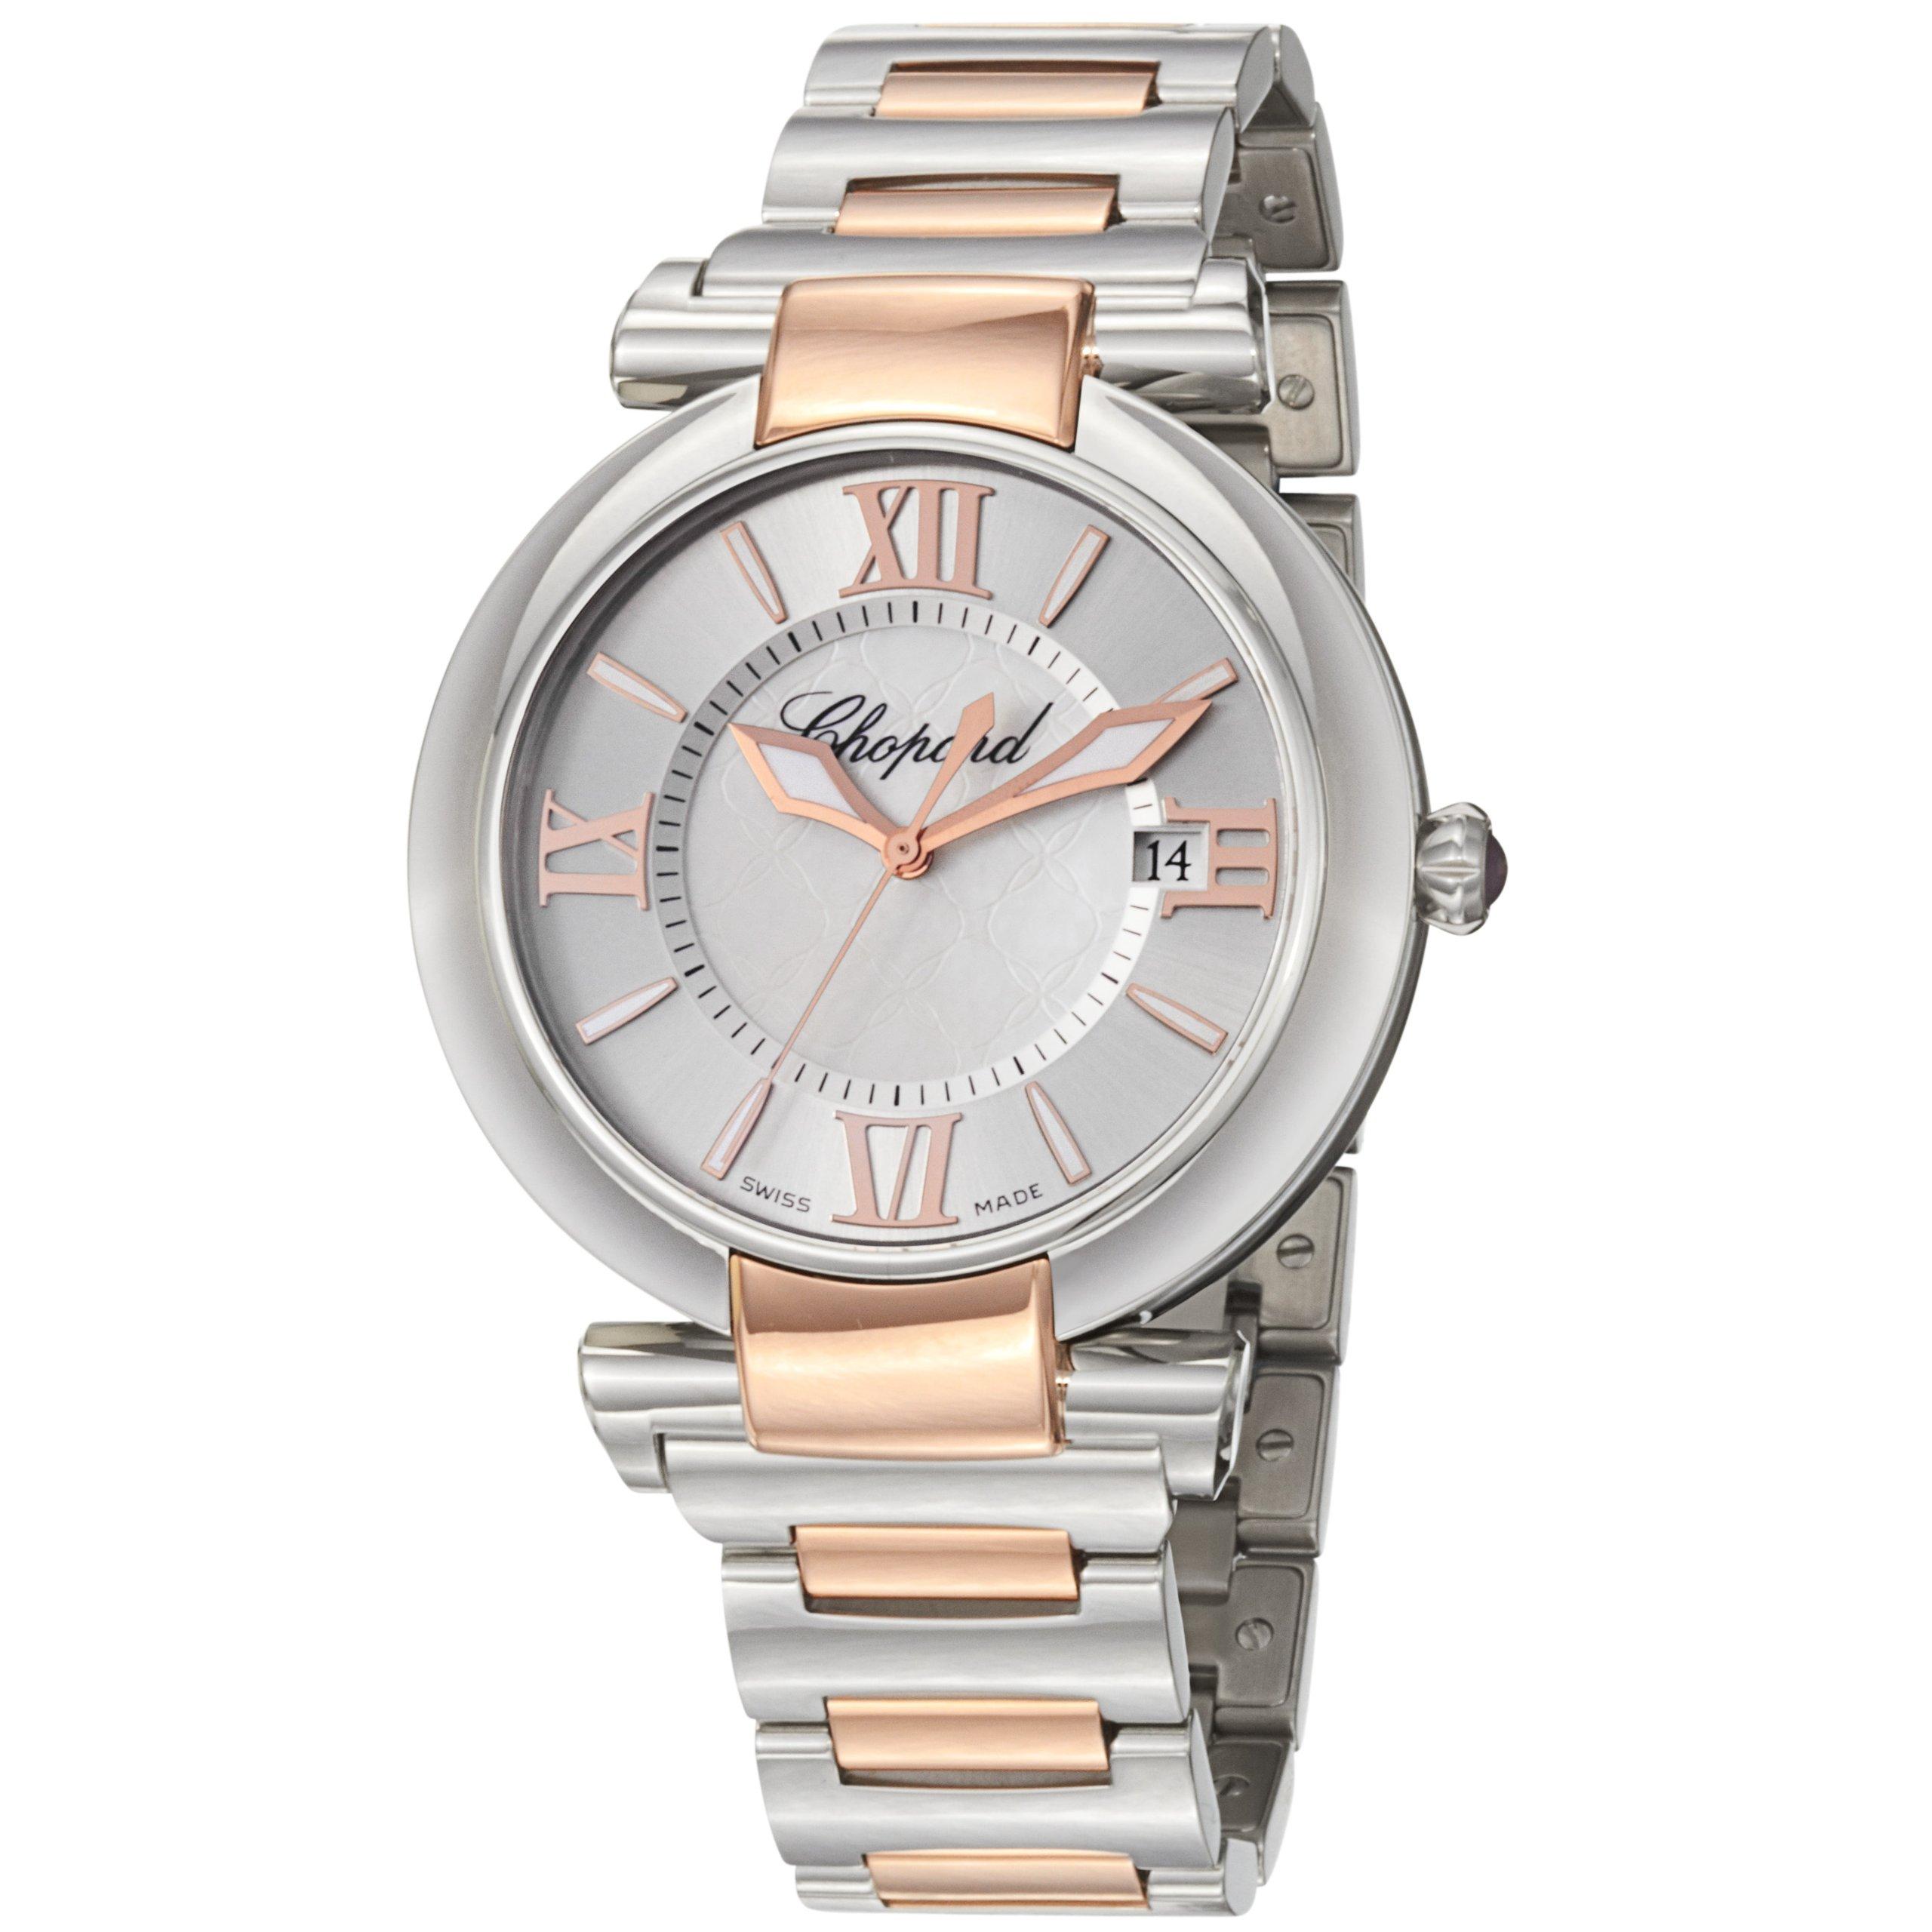 Chopard Women's 388531-6002 Imperiale Two Tone Silver Dial Watch